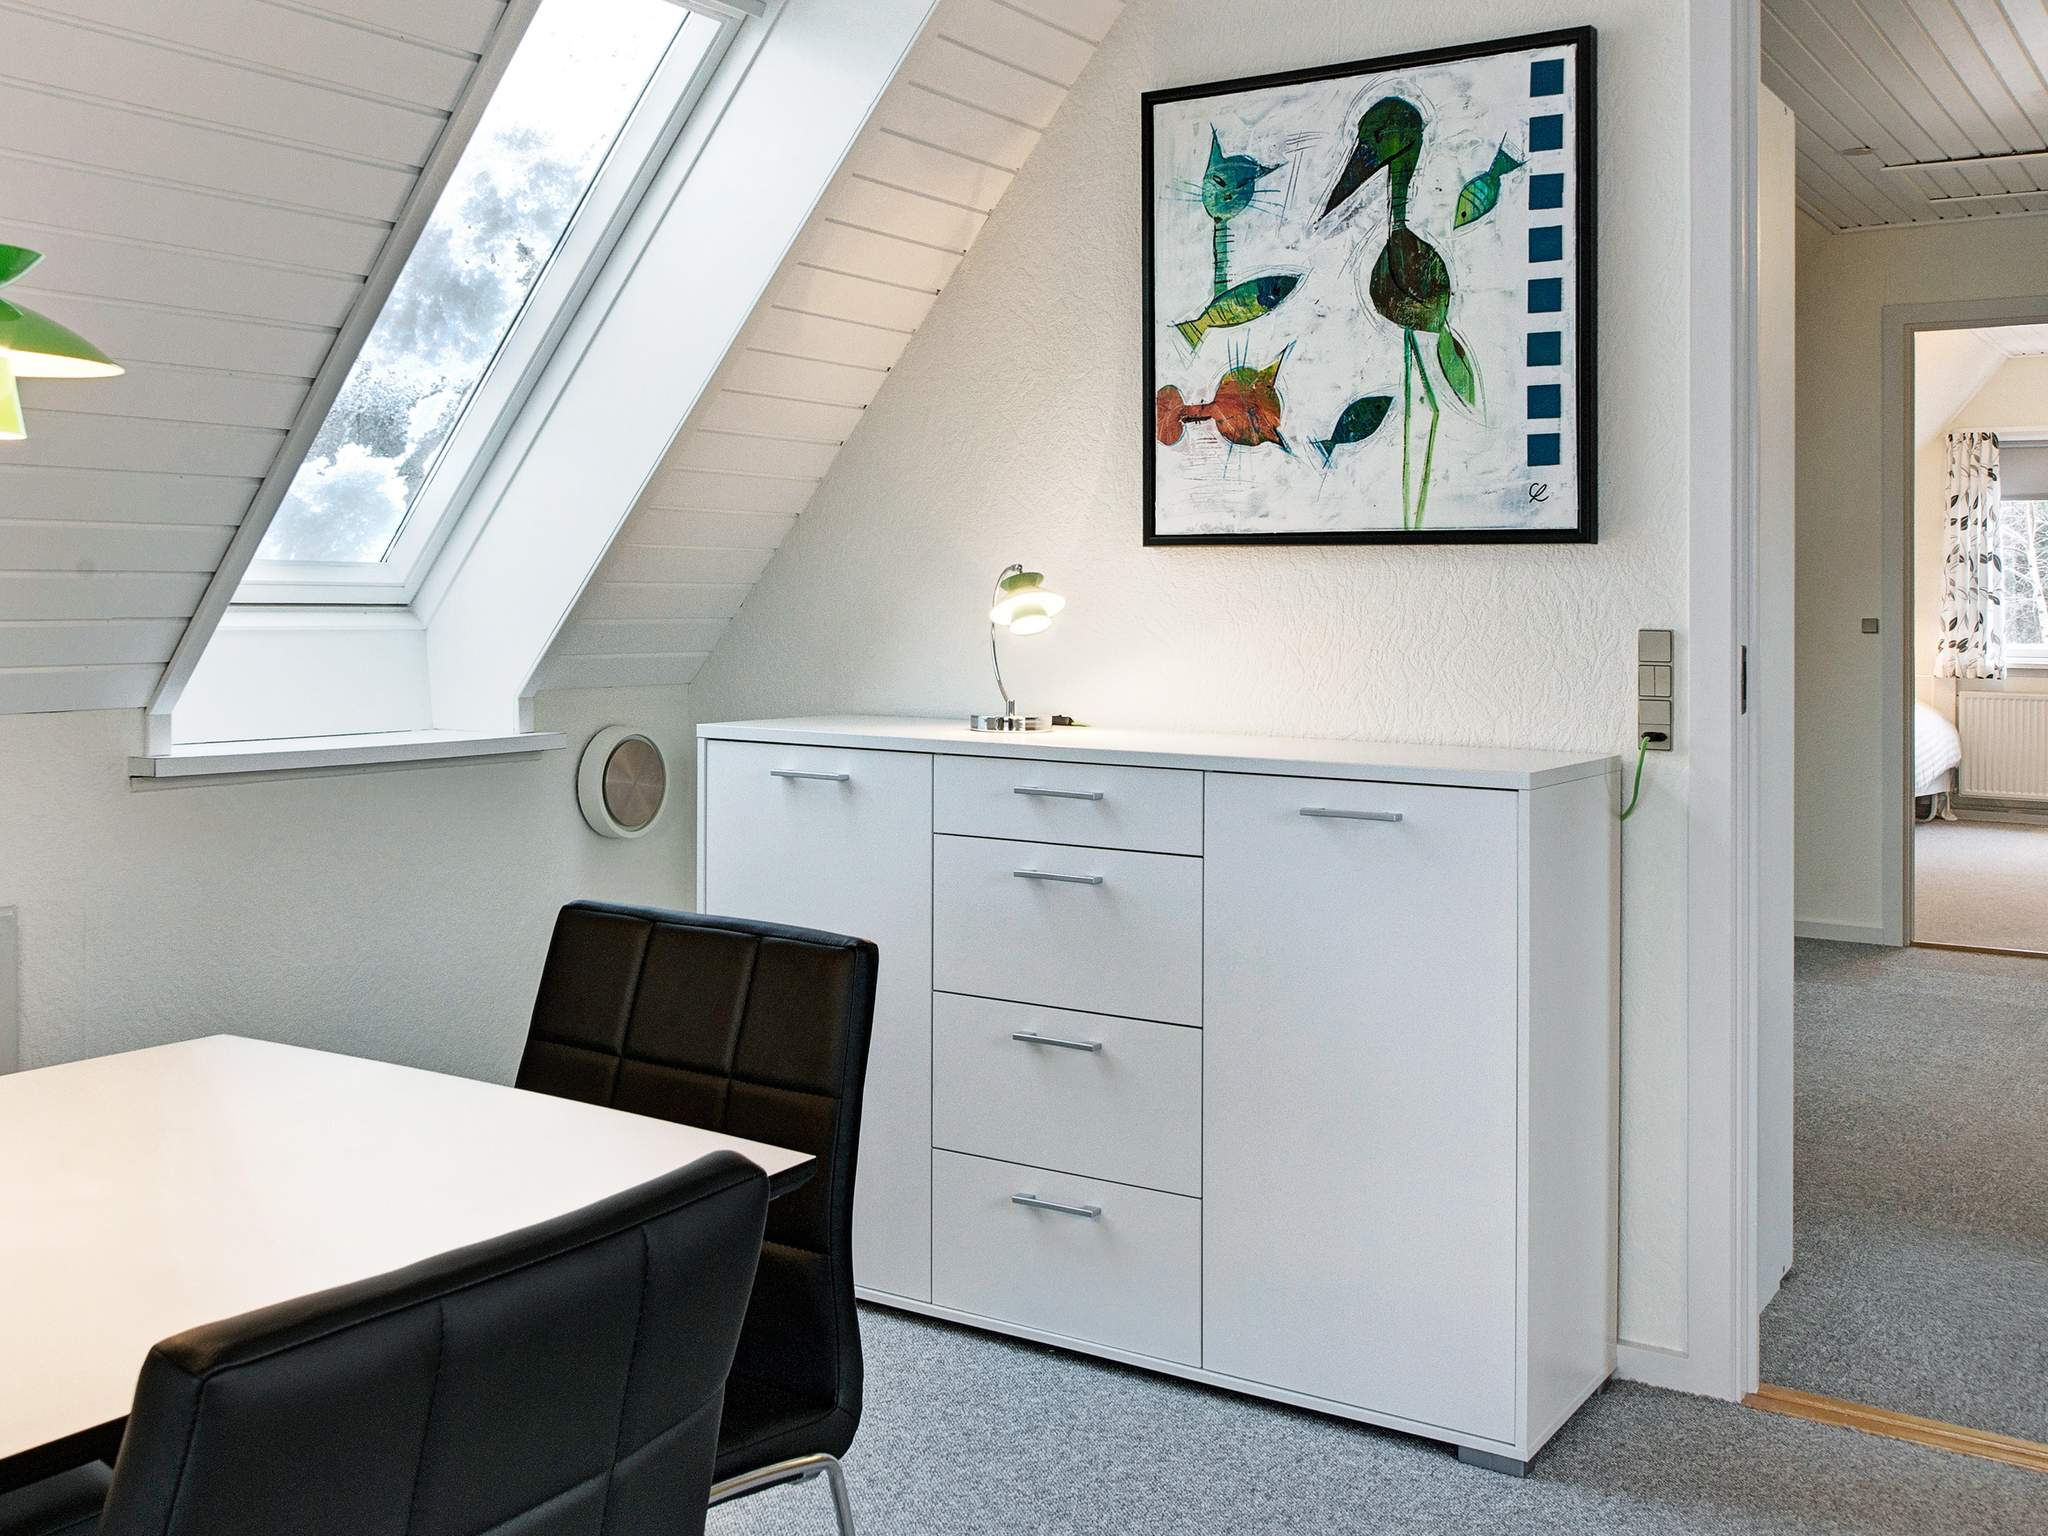 Ferienhaus Balka Strand (921368), Balke, , Bornholm, Dänemark, Bild 4